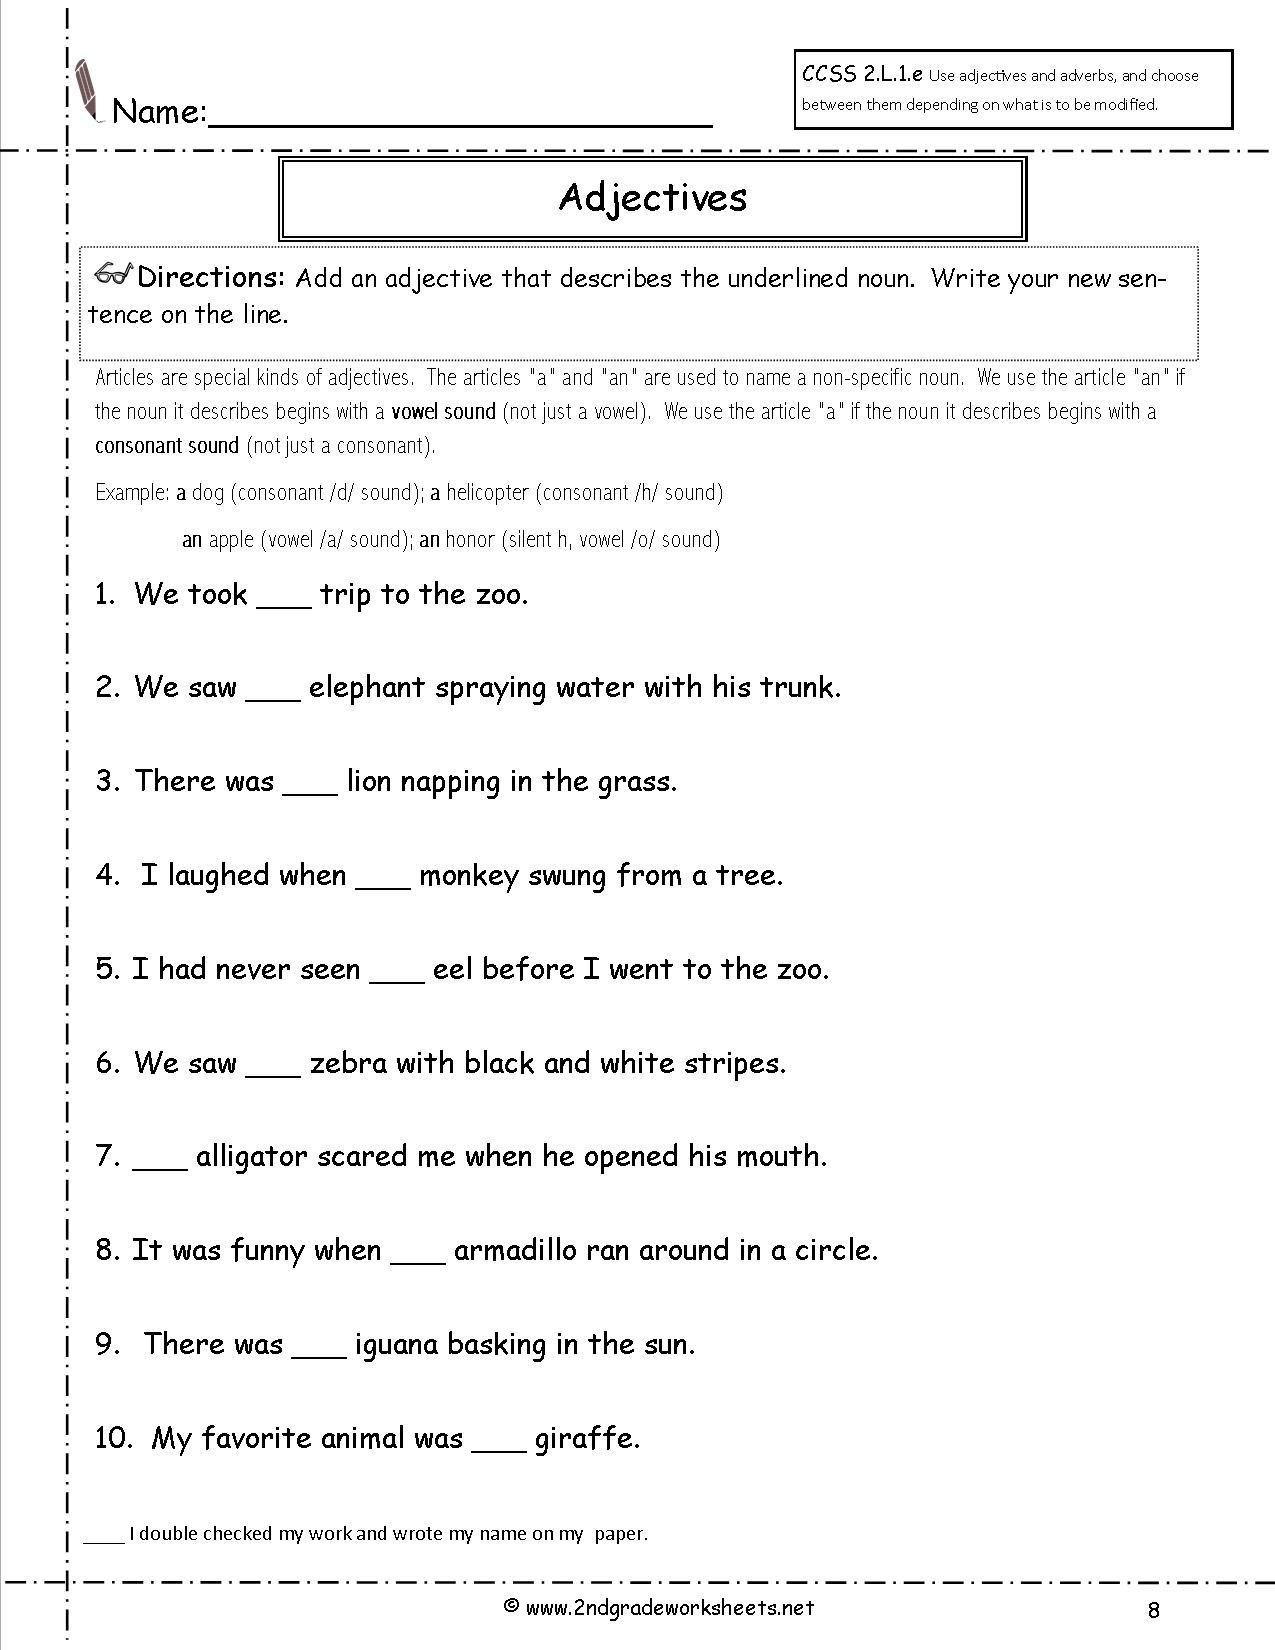 Free Language/grammar Worksheets And Printouts - Free Printable Third Grade Grammar Worksheets